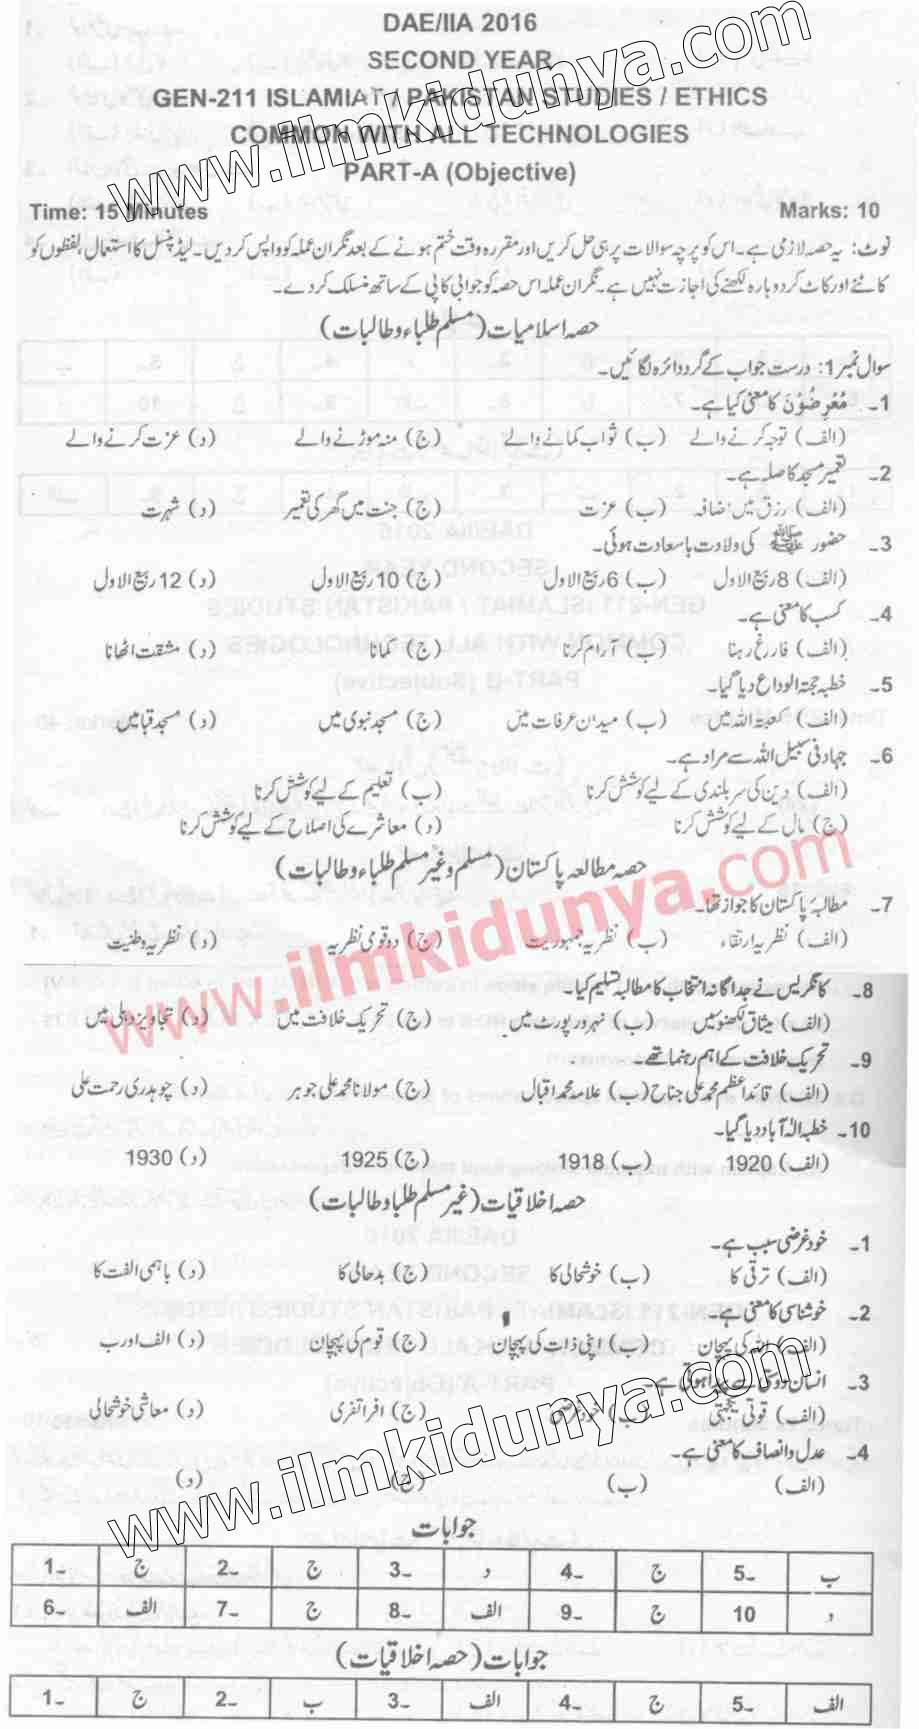 DAE IA 2016 Past Papers Civil 2nd Year Islamiat Pakistan